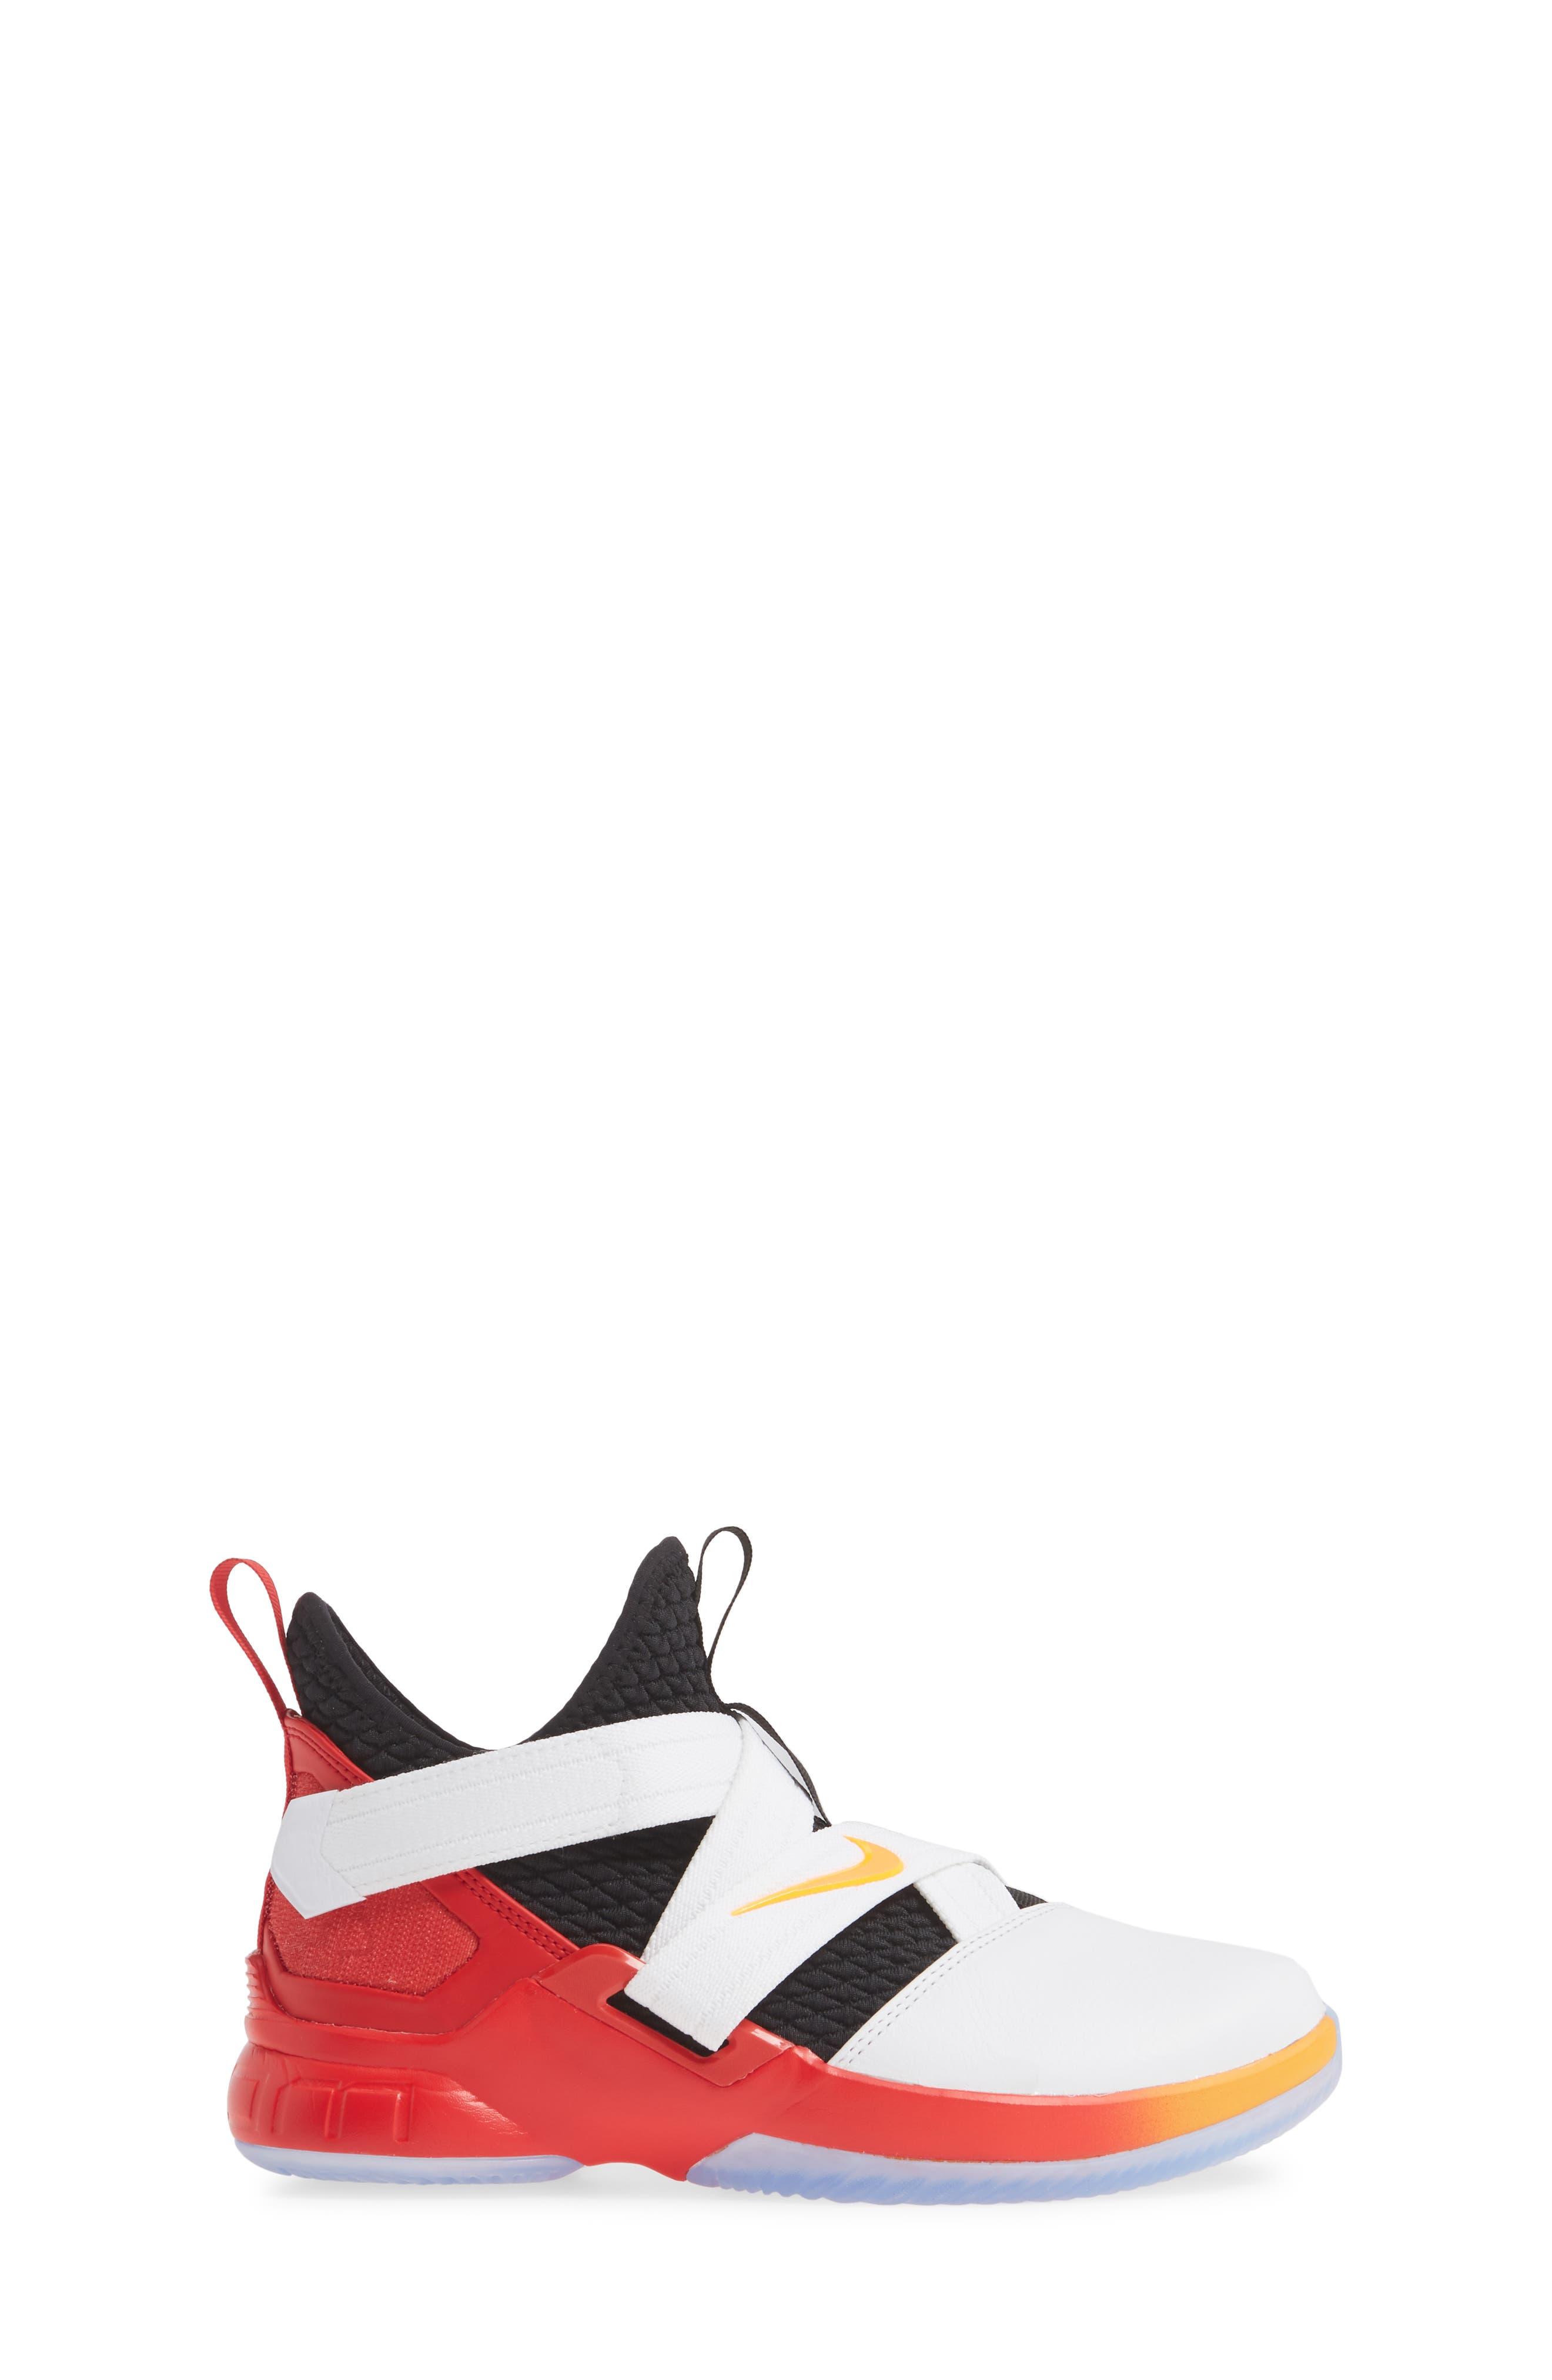 NIKE, LeBron Soldier XII Basketball Shoe, Alternate thumbnail 3, color, WHITE/ LASER ORANGE-BLACK-RED